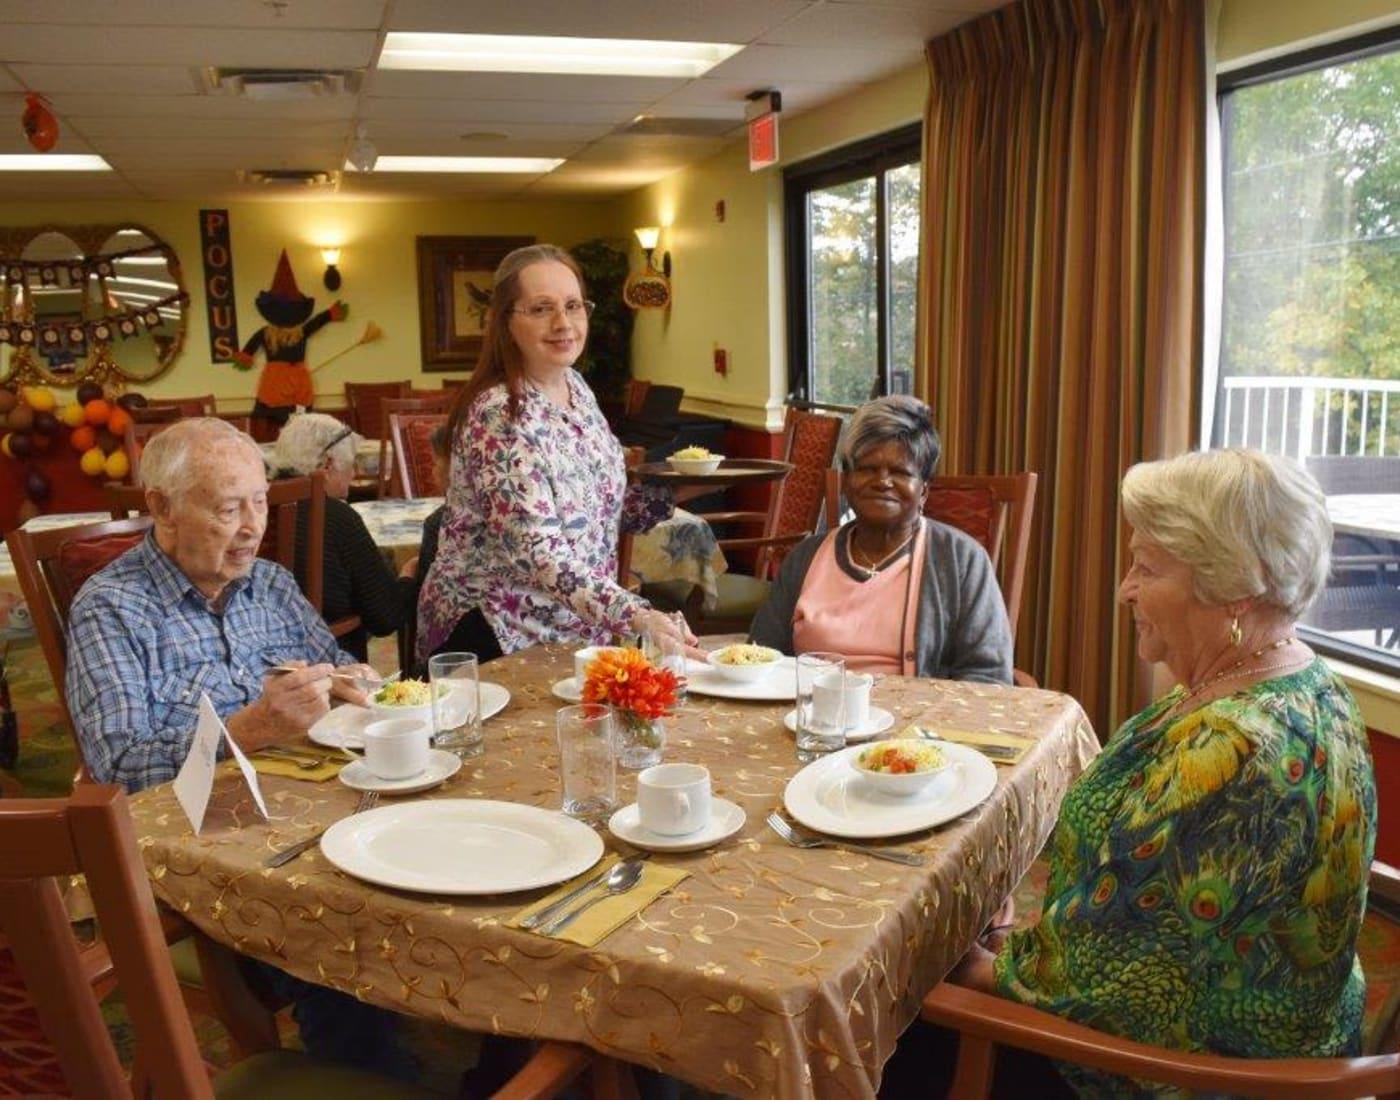 Residents enjoying restaurant-style dining at Willow Creek Senior Living in Elizabethtown, Kentucky.